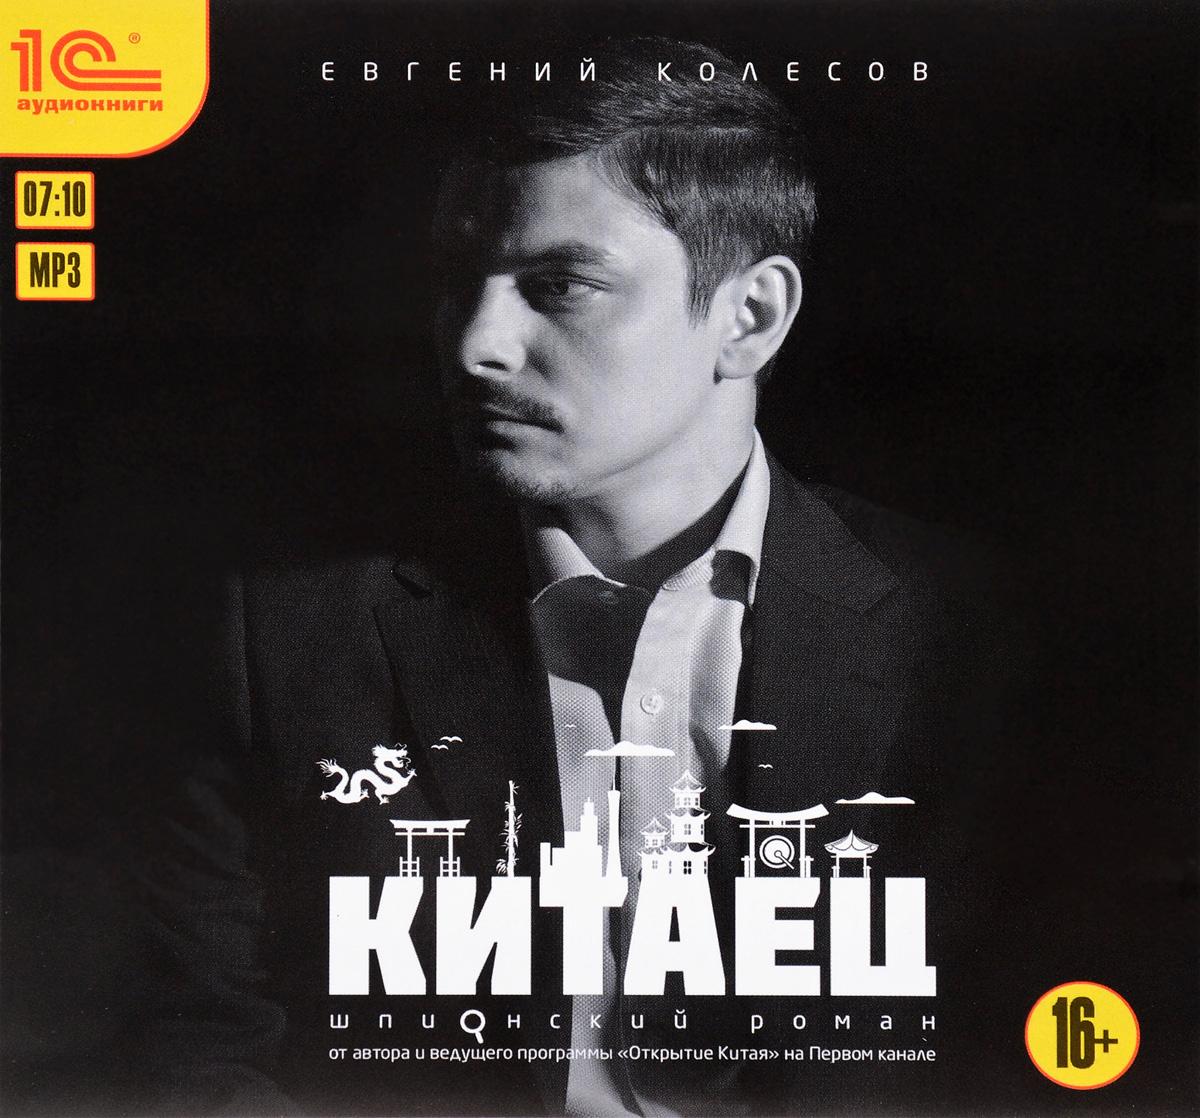 Китаец (аудиокнига на CD MP3) | Колесов Евгений Викторович #1